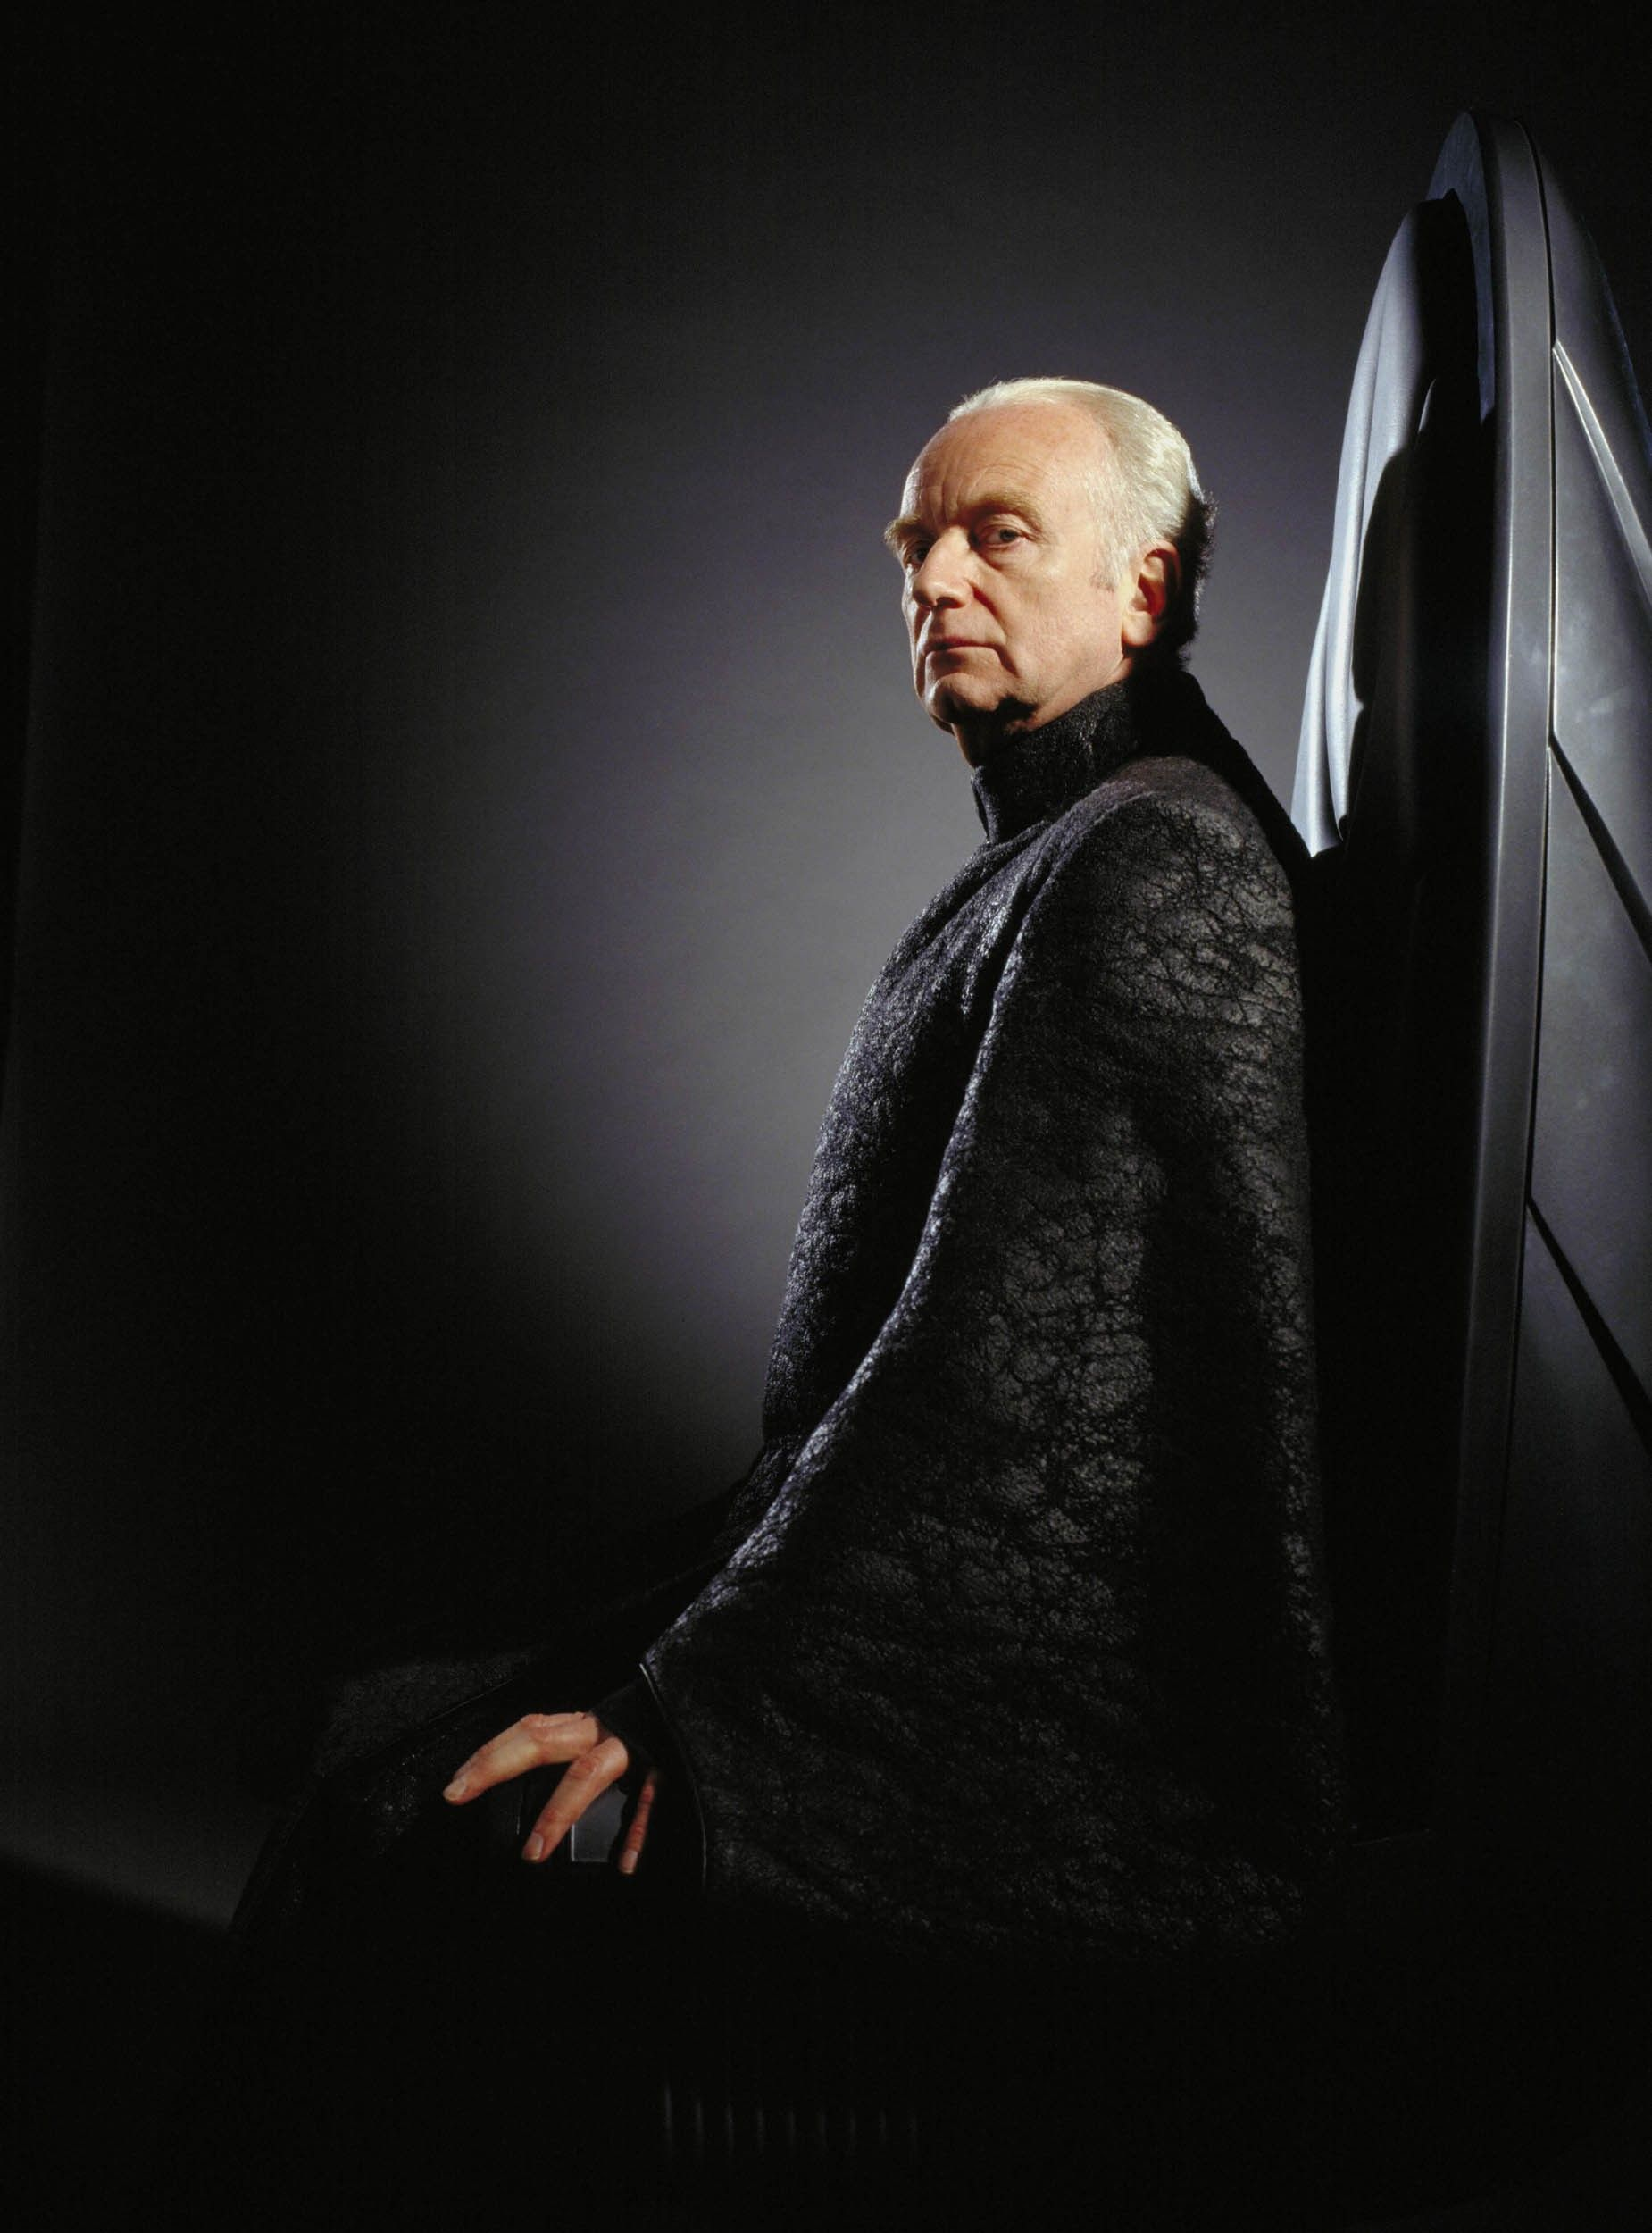 Chancellor Palpatine aka Darth Sidious | Star Wars | Pinterest